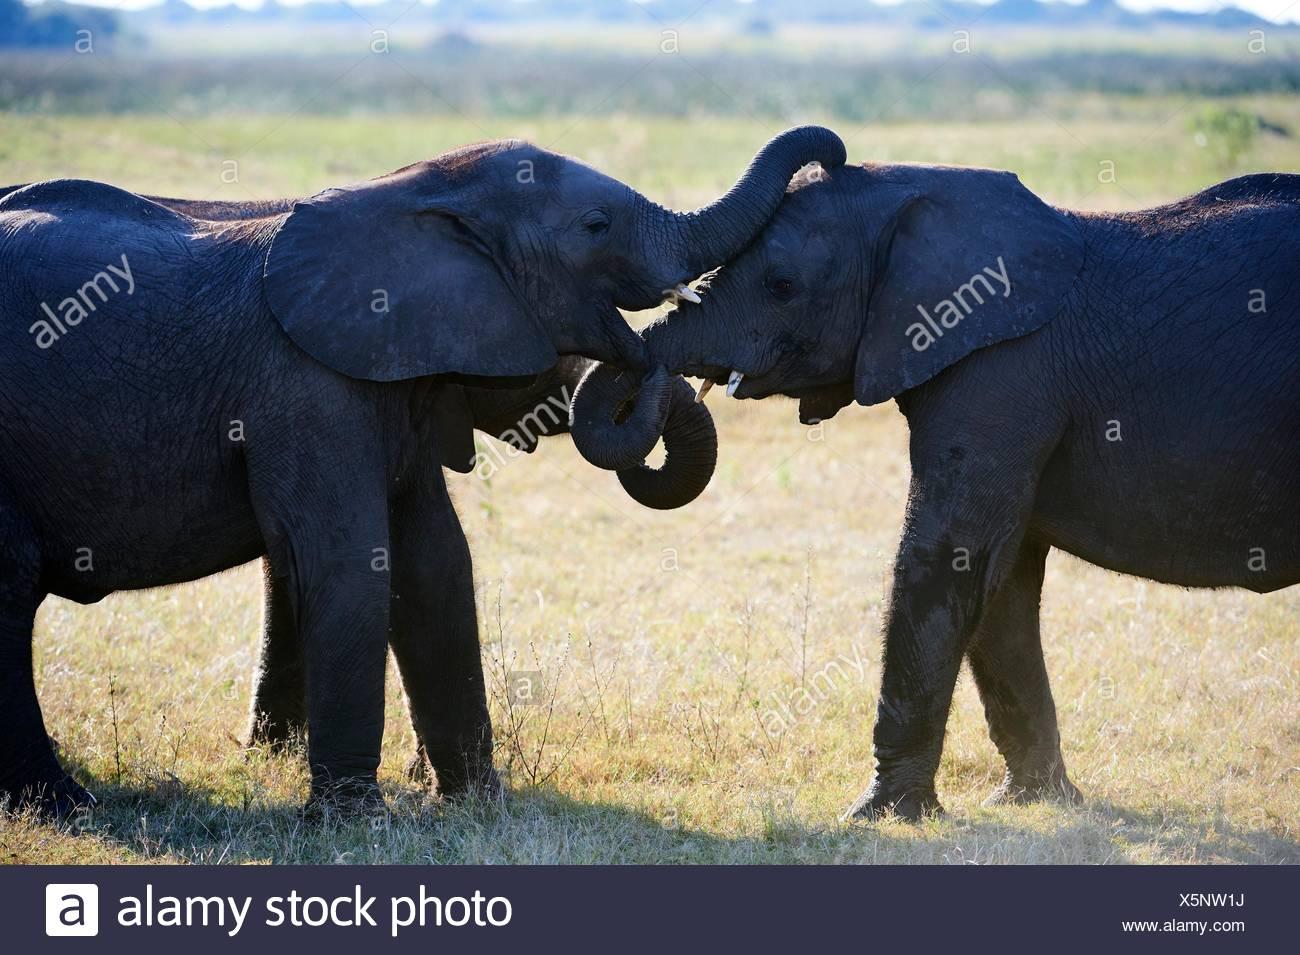 Two African elephant juveniles sparring (Loxodonta africana), Duba Plains, Okavango Delta, Botswana, Southern Africa. - Stock Image